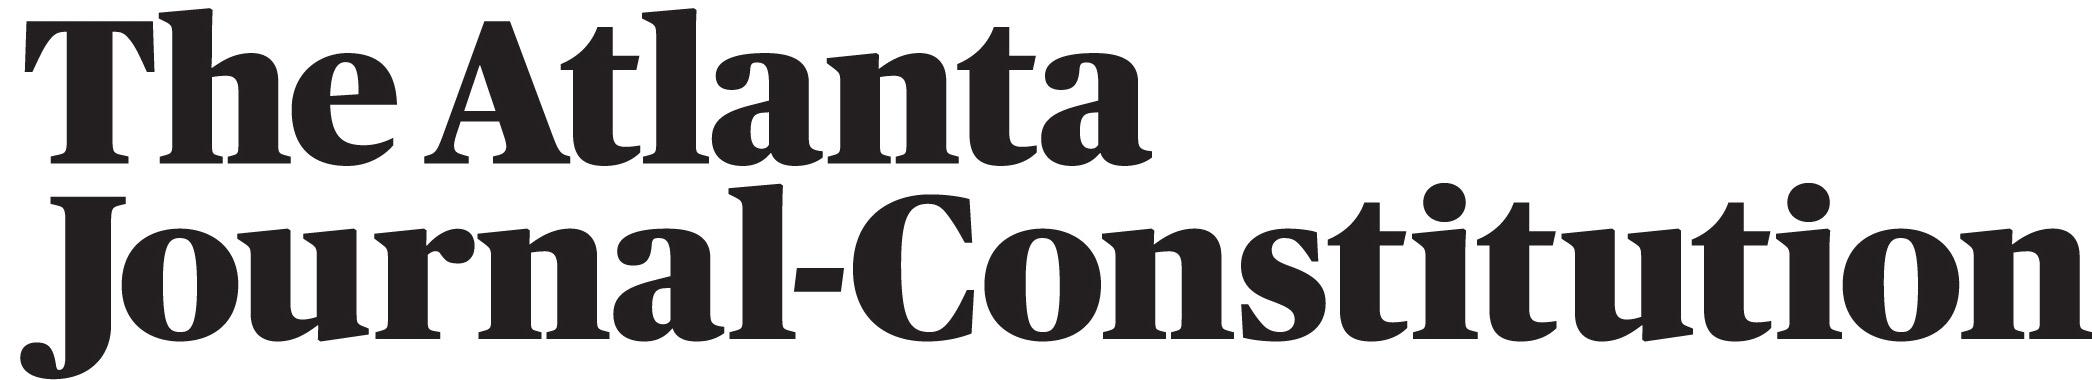 Review:'LatinGA' exhibit goes beyond origins - The Atlanta Journal-ConstitutionMay 20, 2010